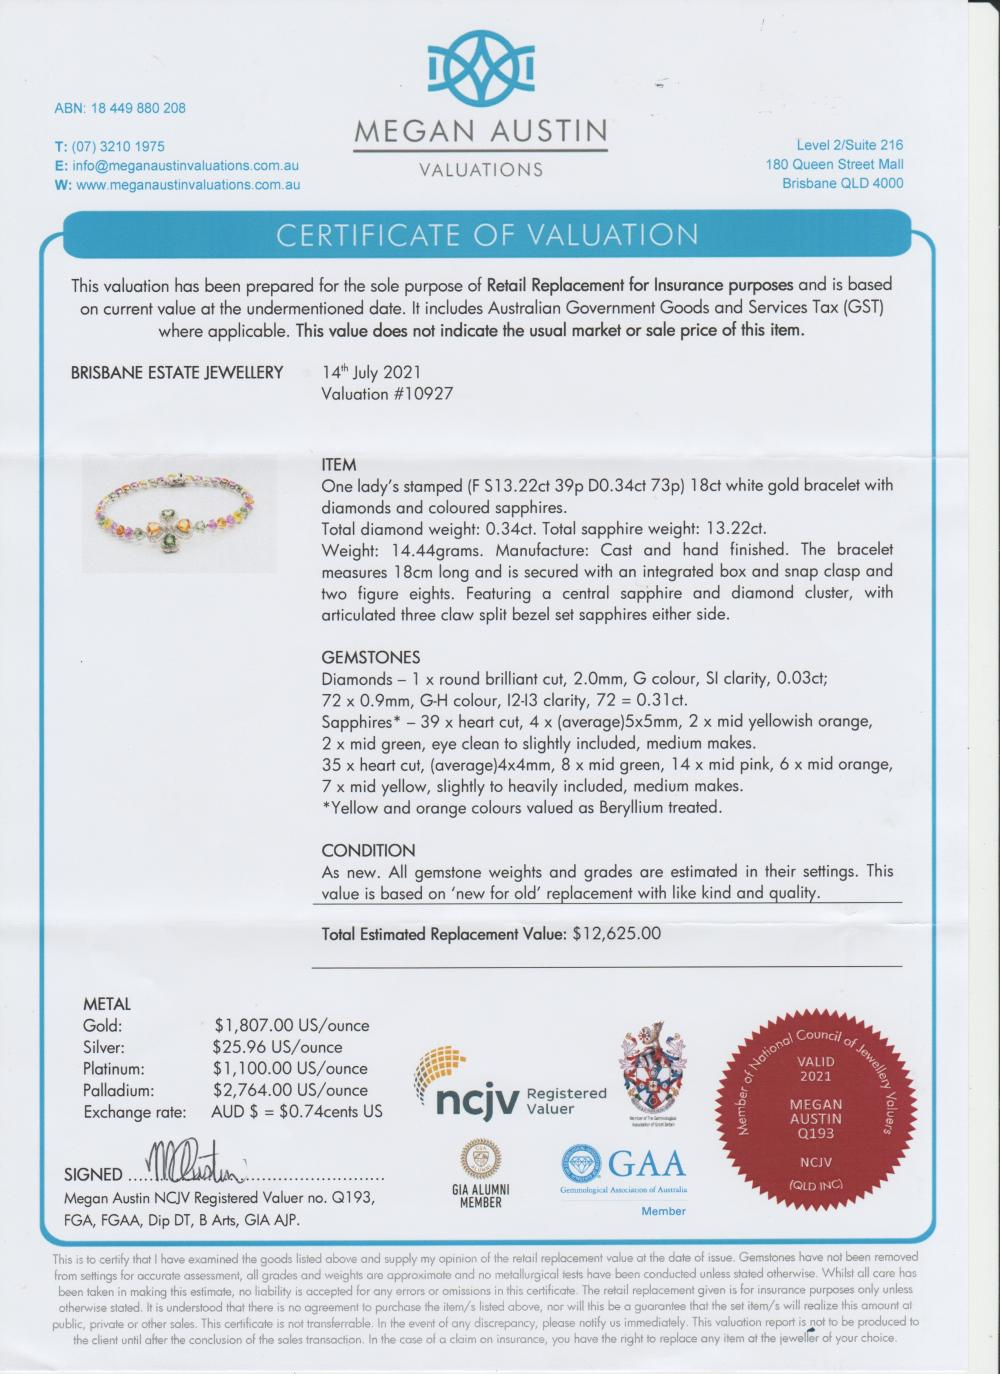 New 18ct white gold coloured sapphire bracelet, 14.44 grams